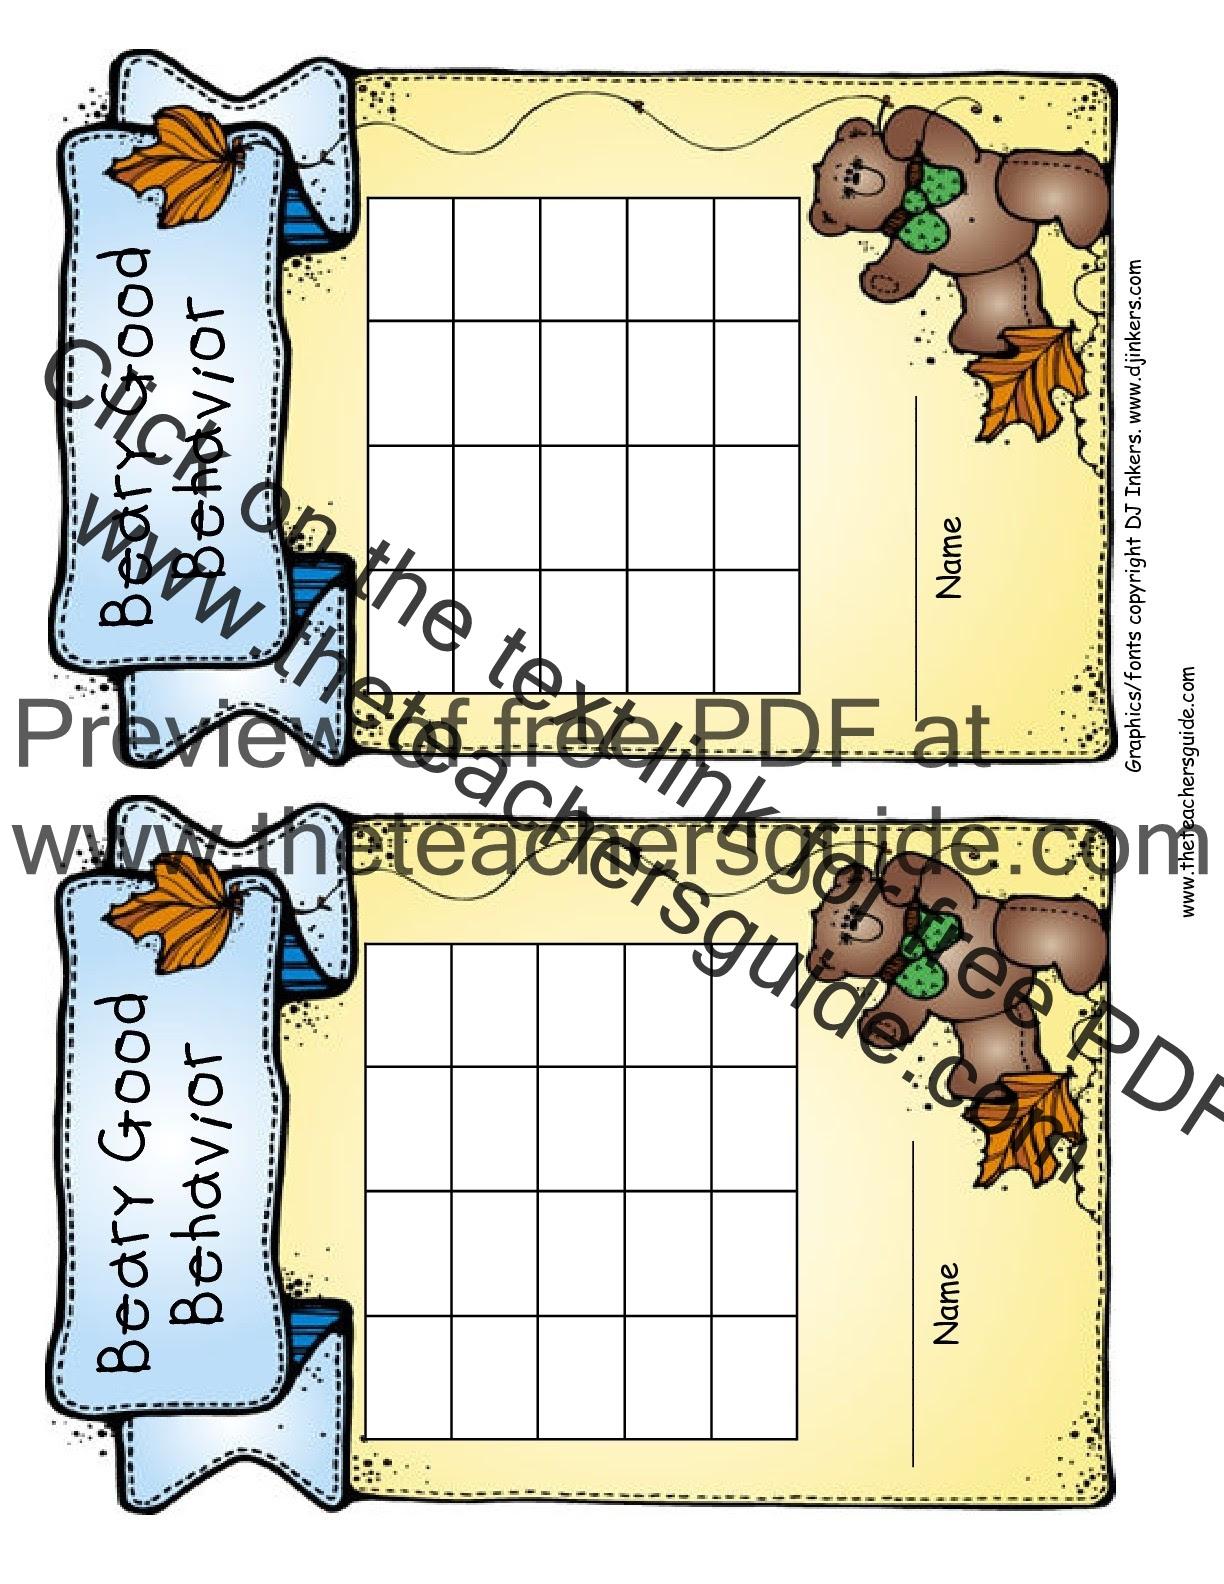 bearygoodbehaviorchartcolor 001 001